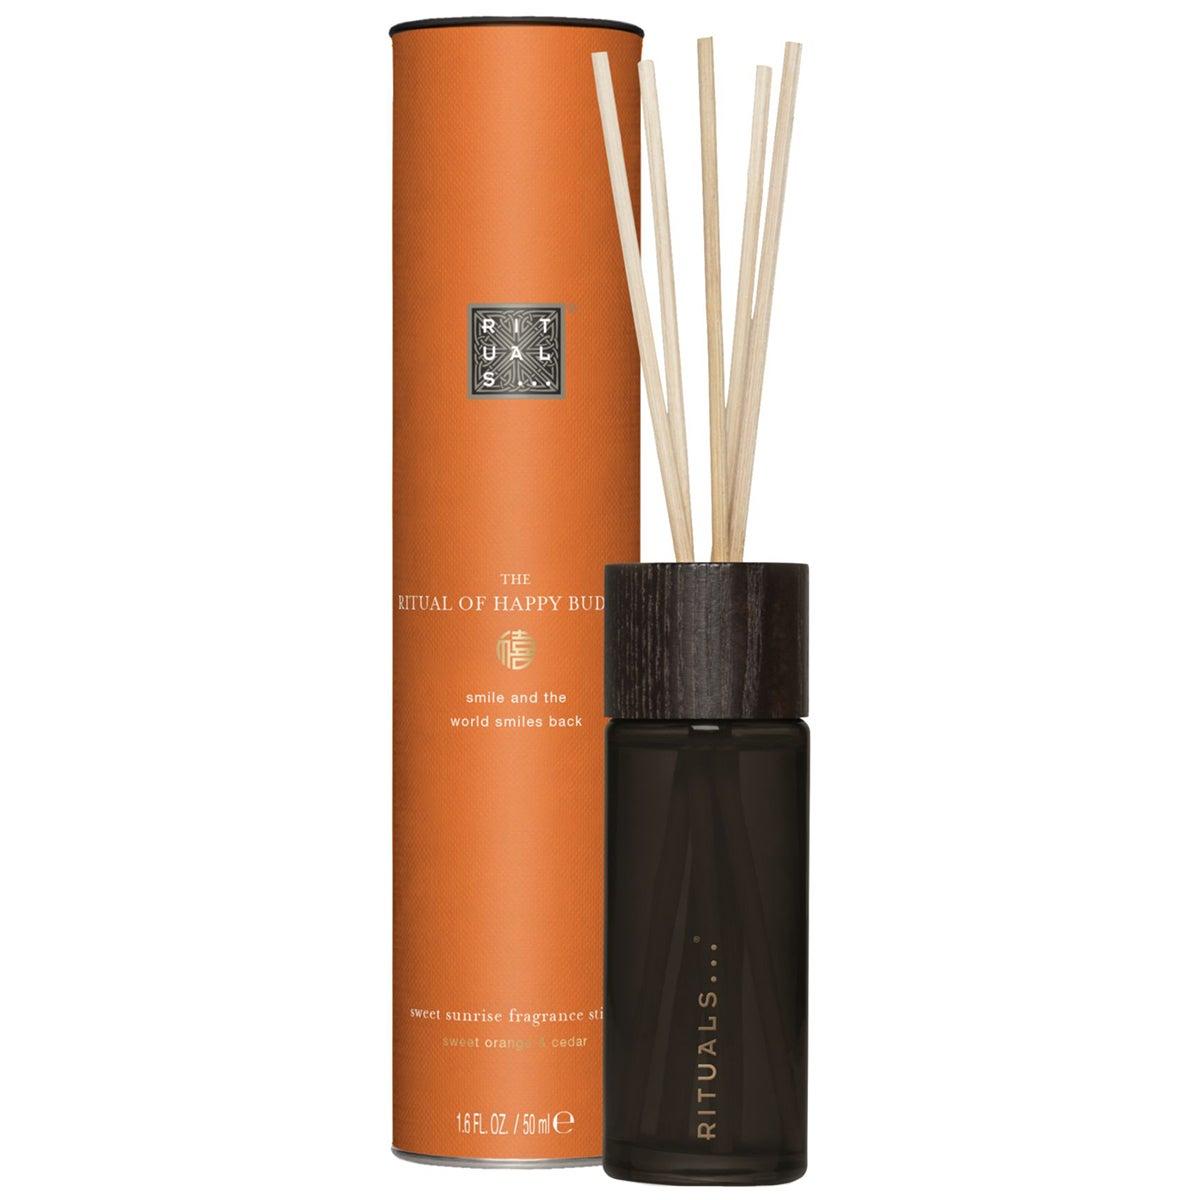 Rituals The Ritual Of Happy Buddha Mini Fragrance Sticks